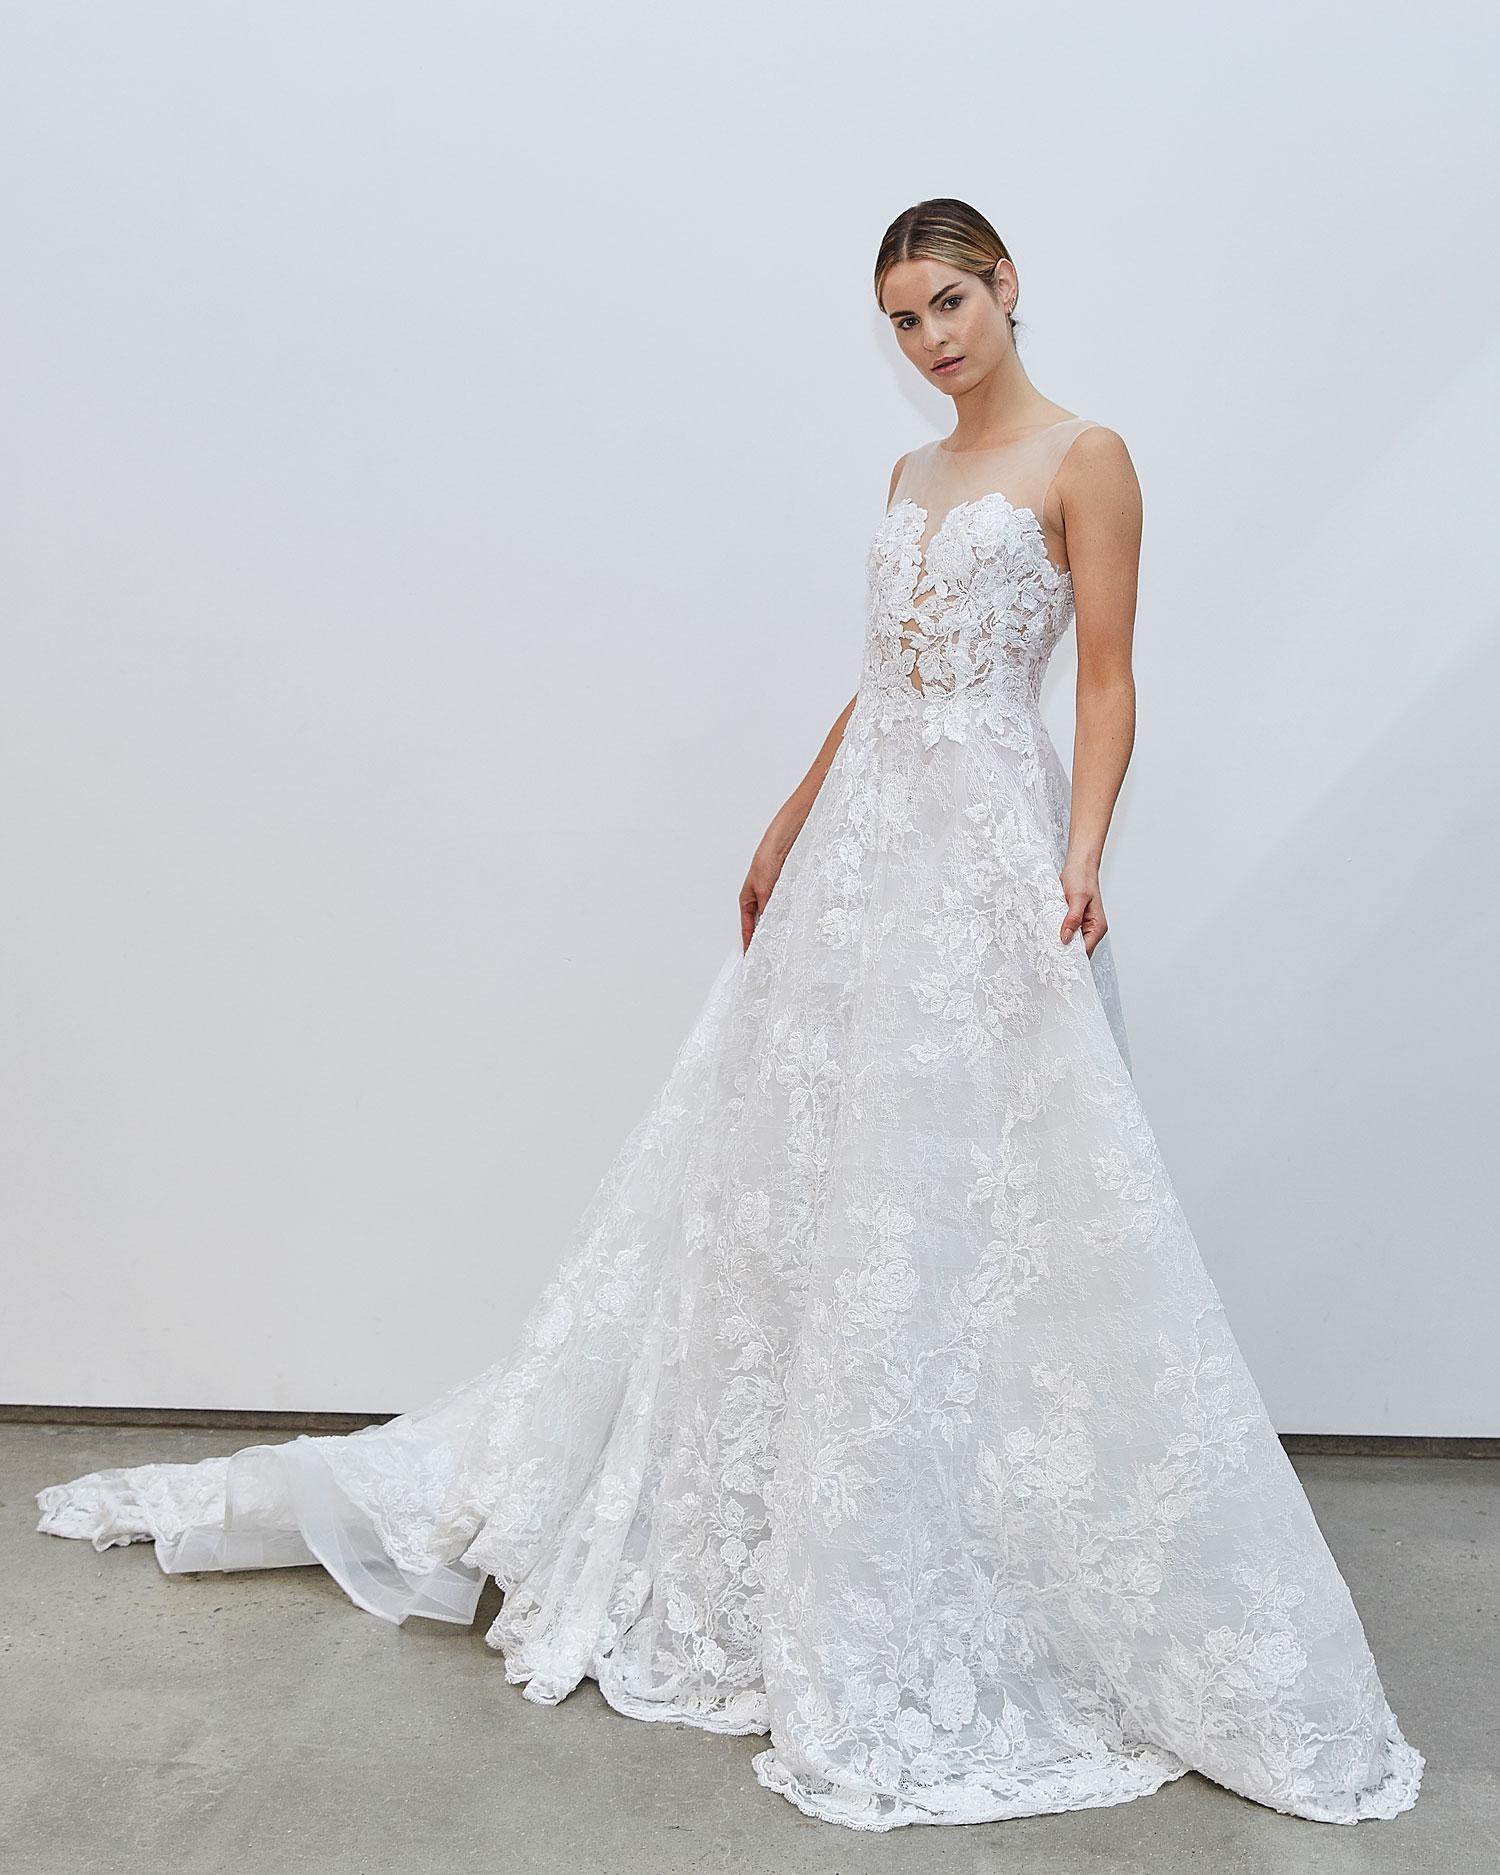 Francesca Miranda Fall 2020 bridal collection Gabrielle lace wedding dress illusion neckline a line skirt